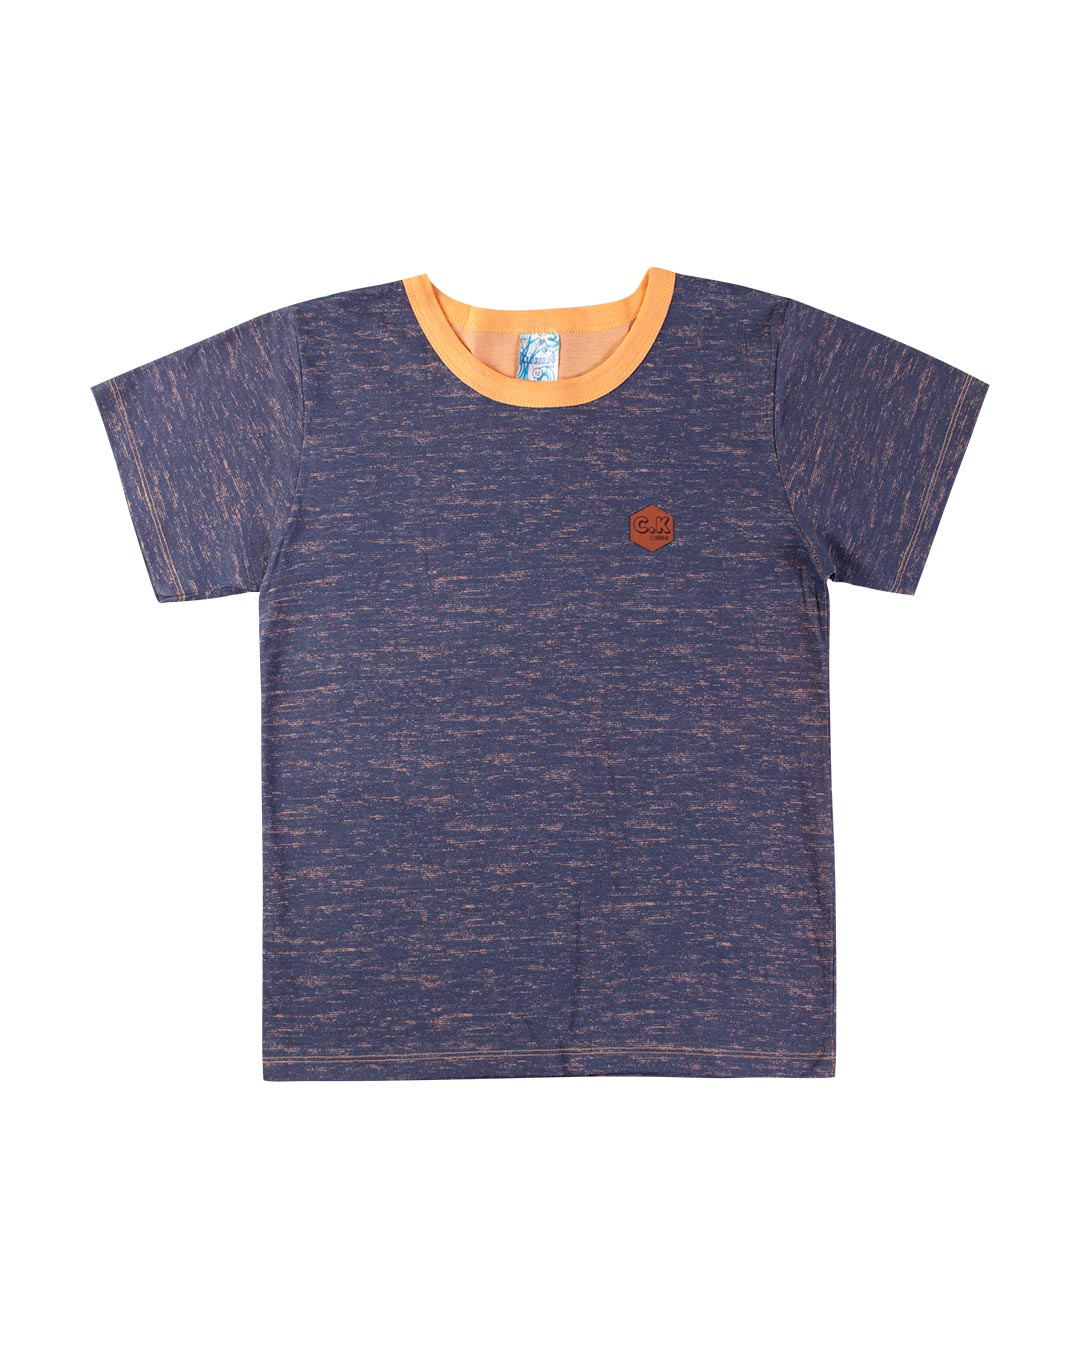 Camiseta Juvenil Clubinho C.K - Clubinho